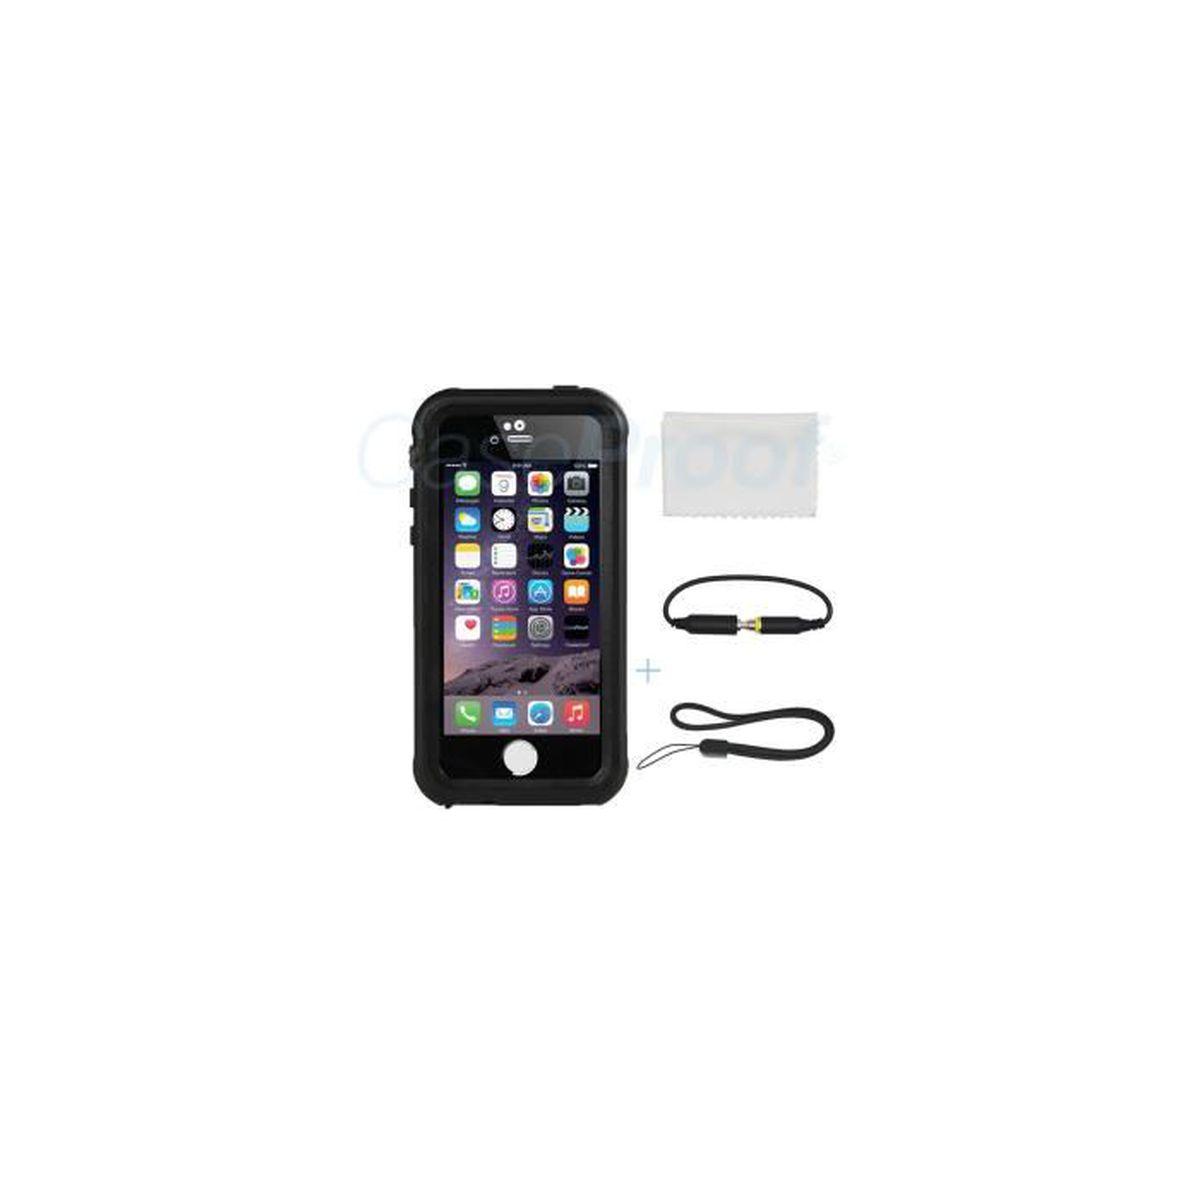 coque etanche anti choc pour iphone 5 5s freetou